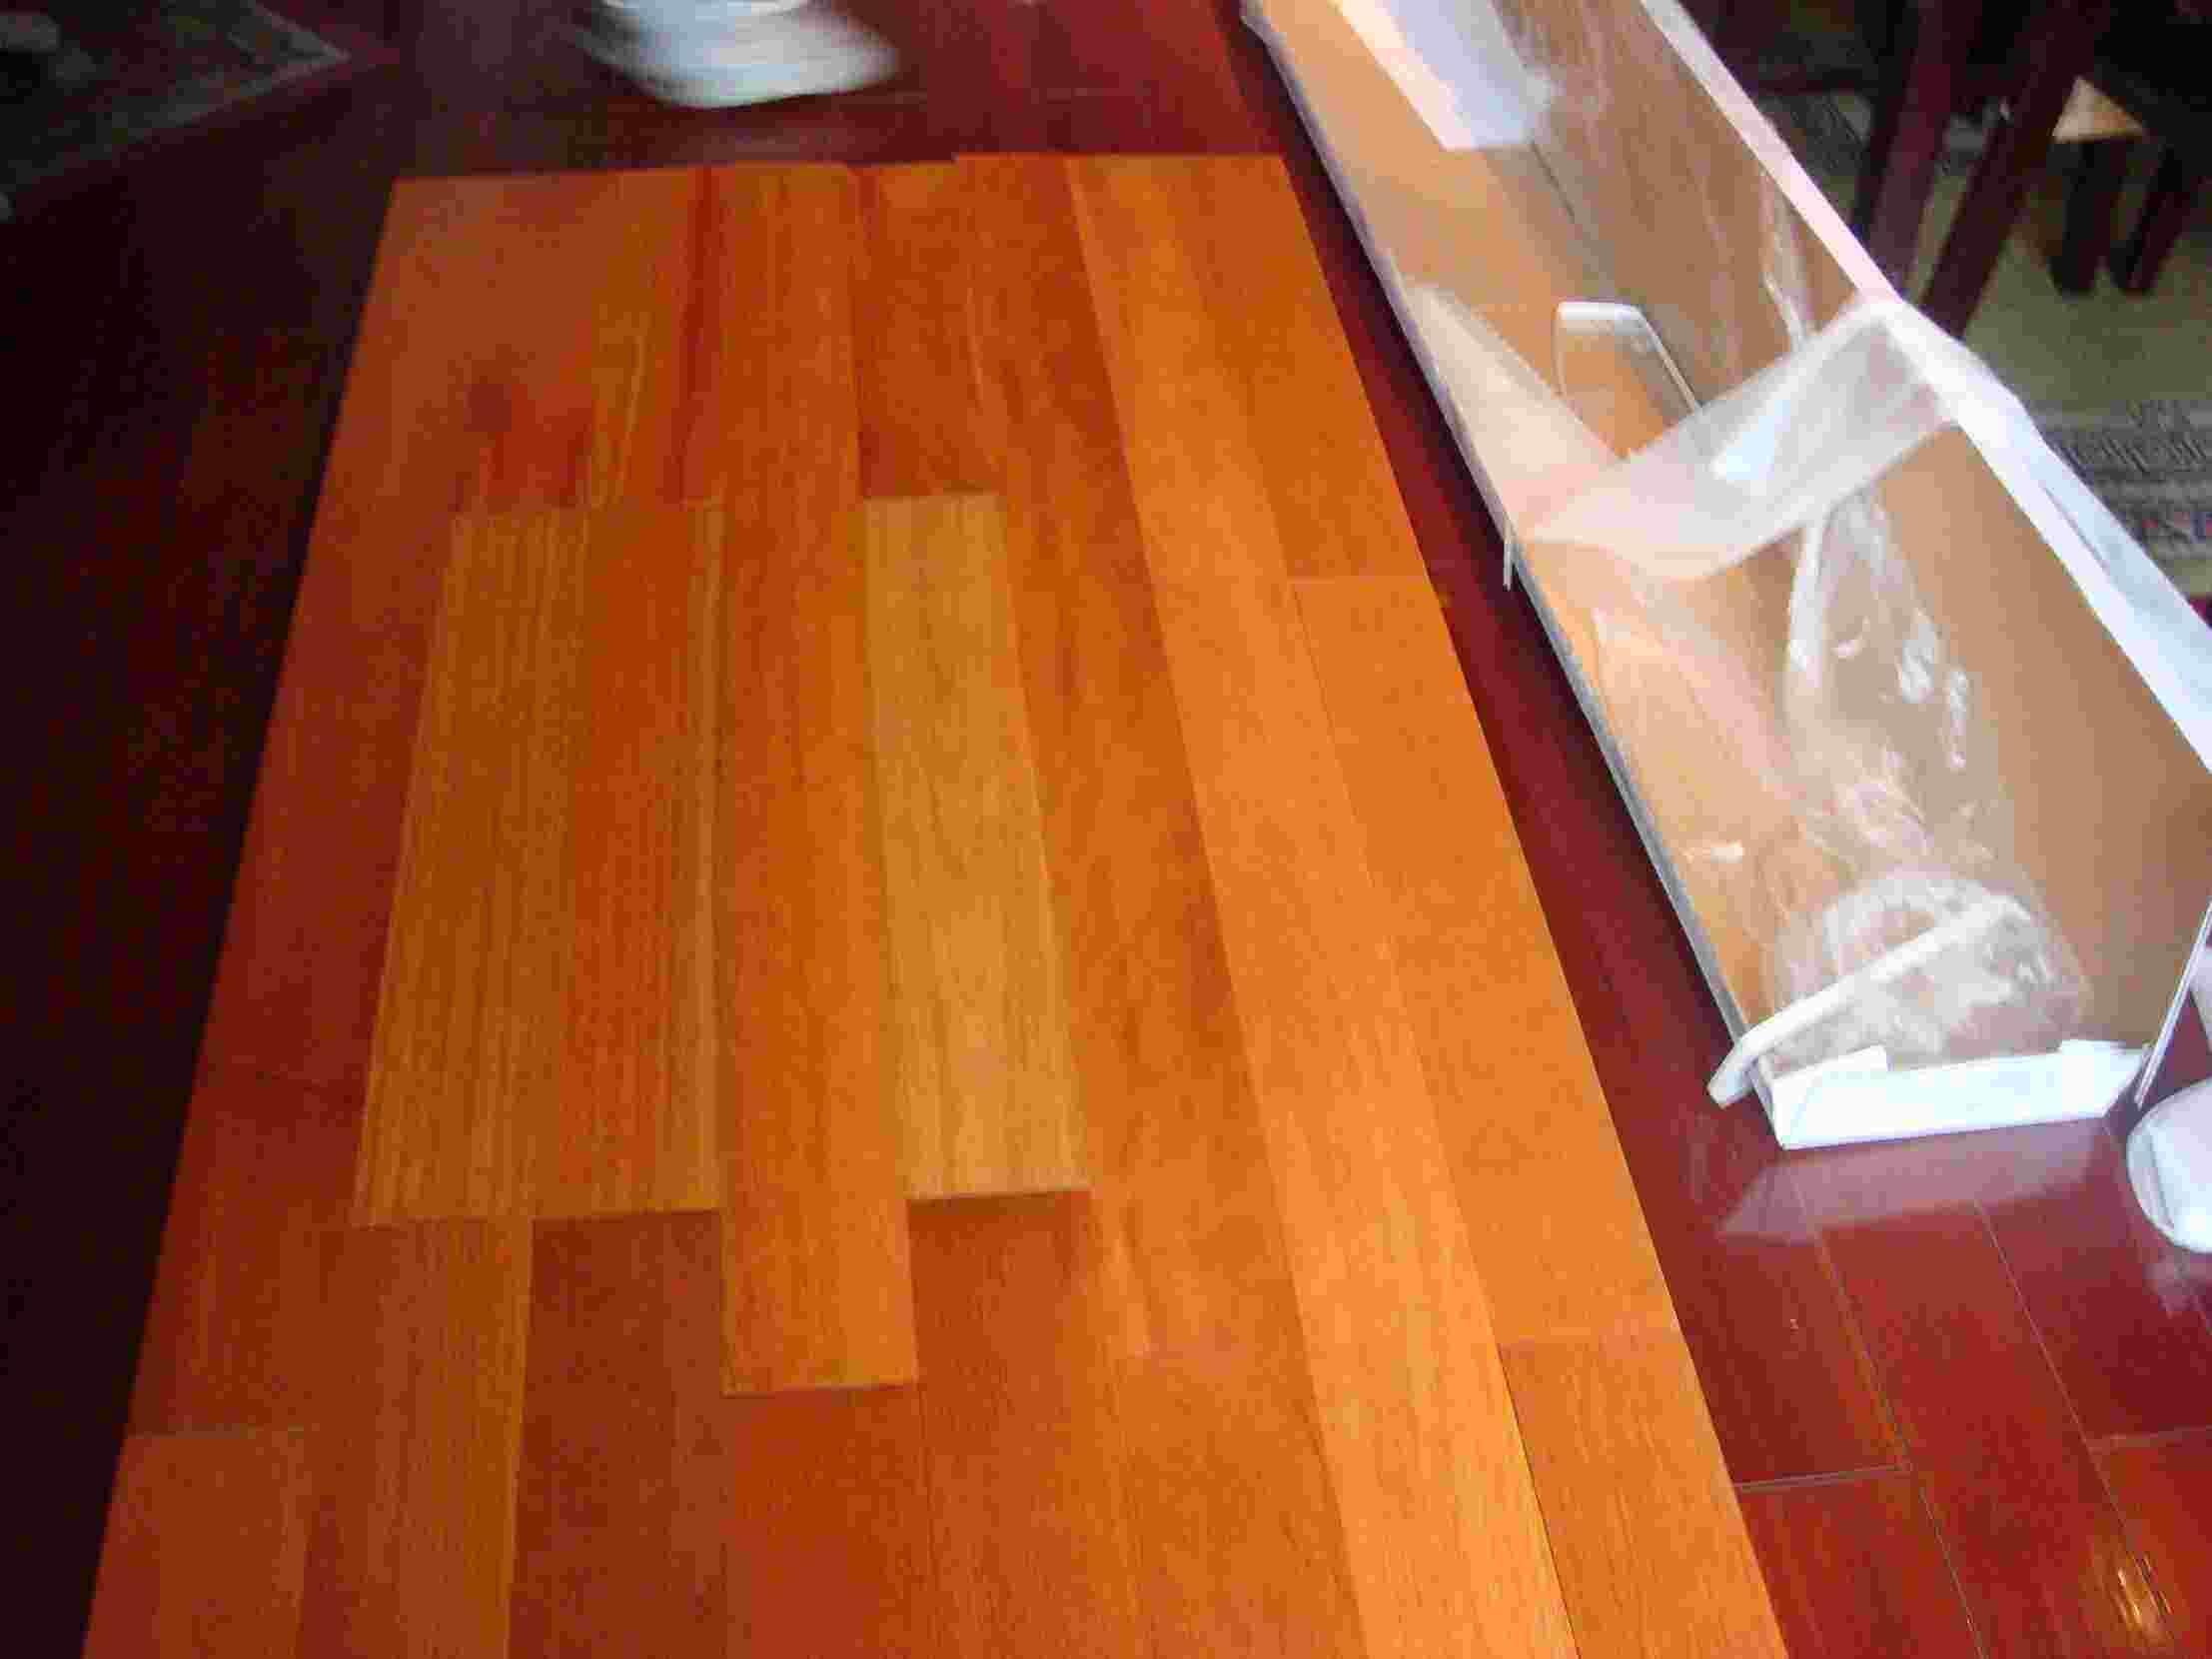 China kempas wood floor china kempas flooring kempas for Kempas hardwood flooring